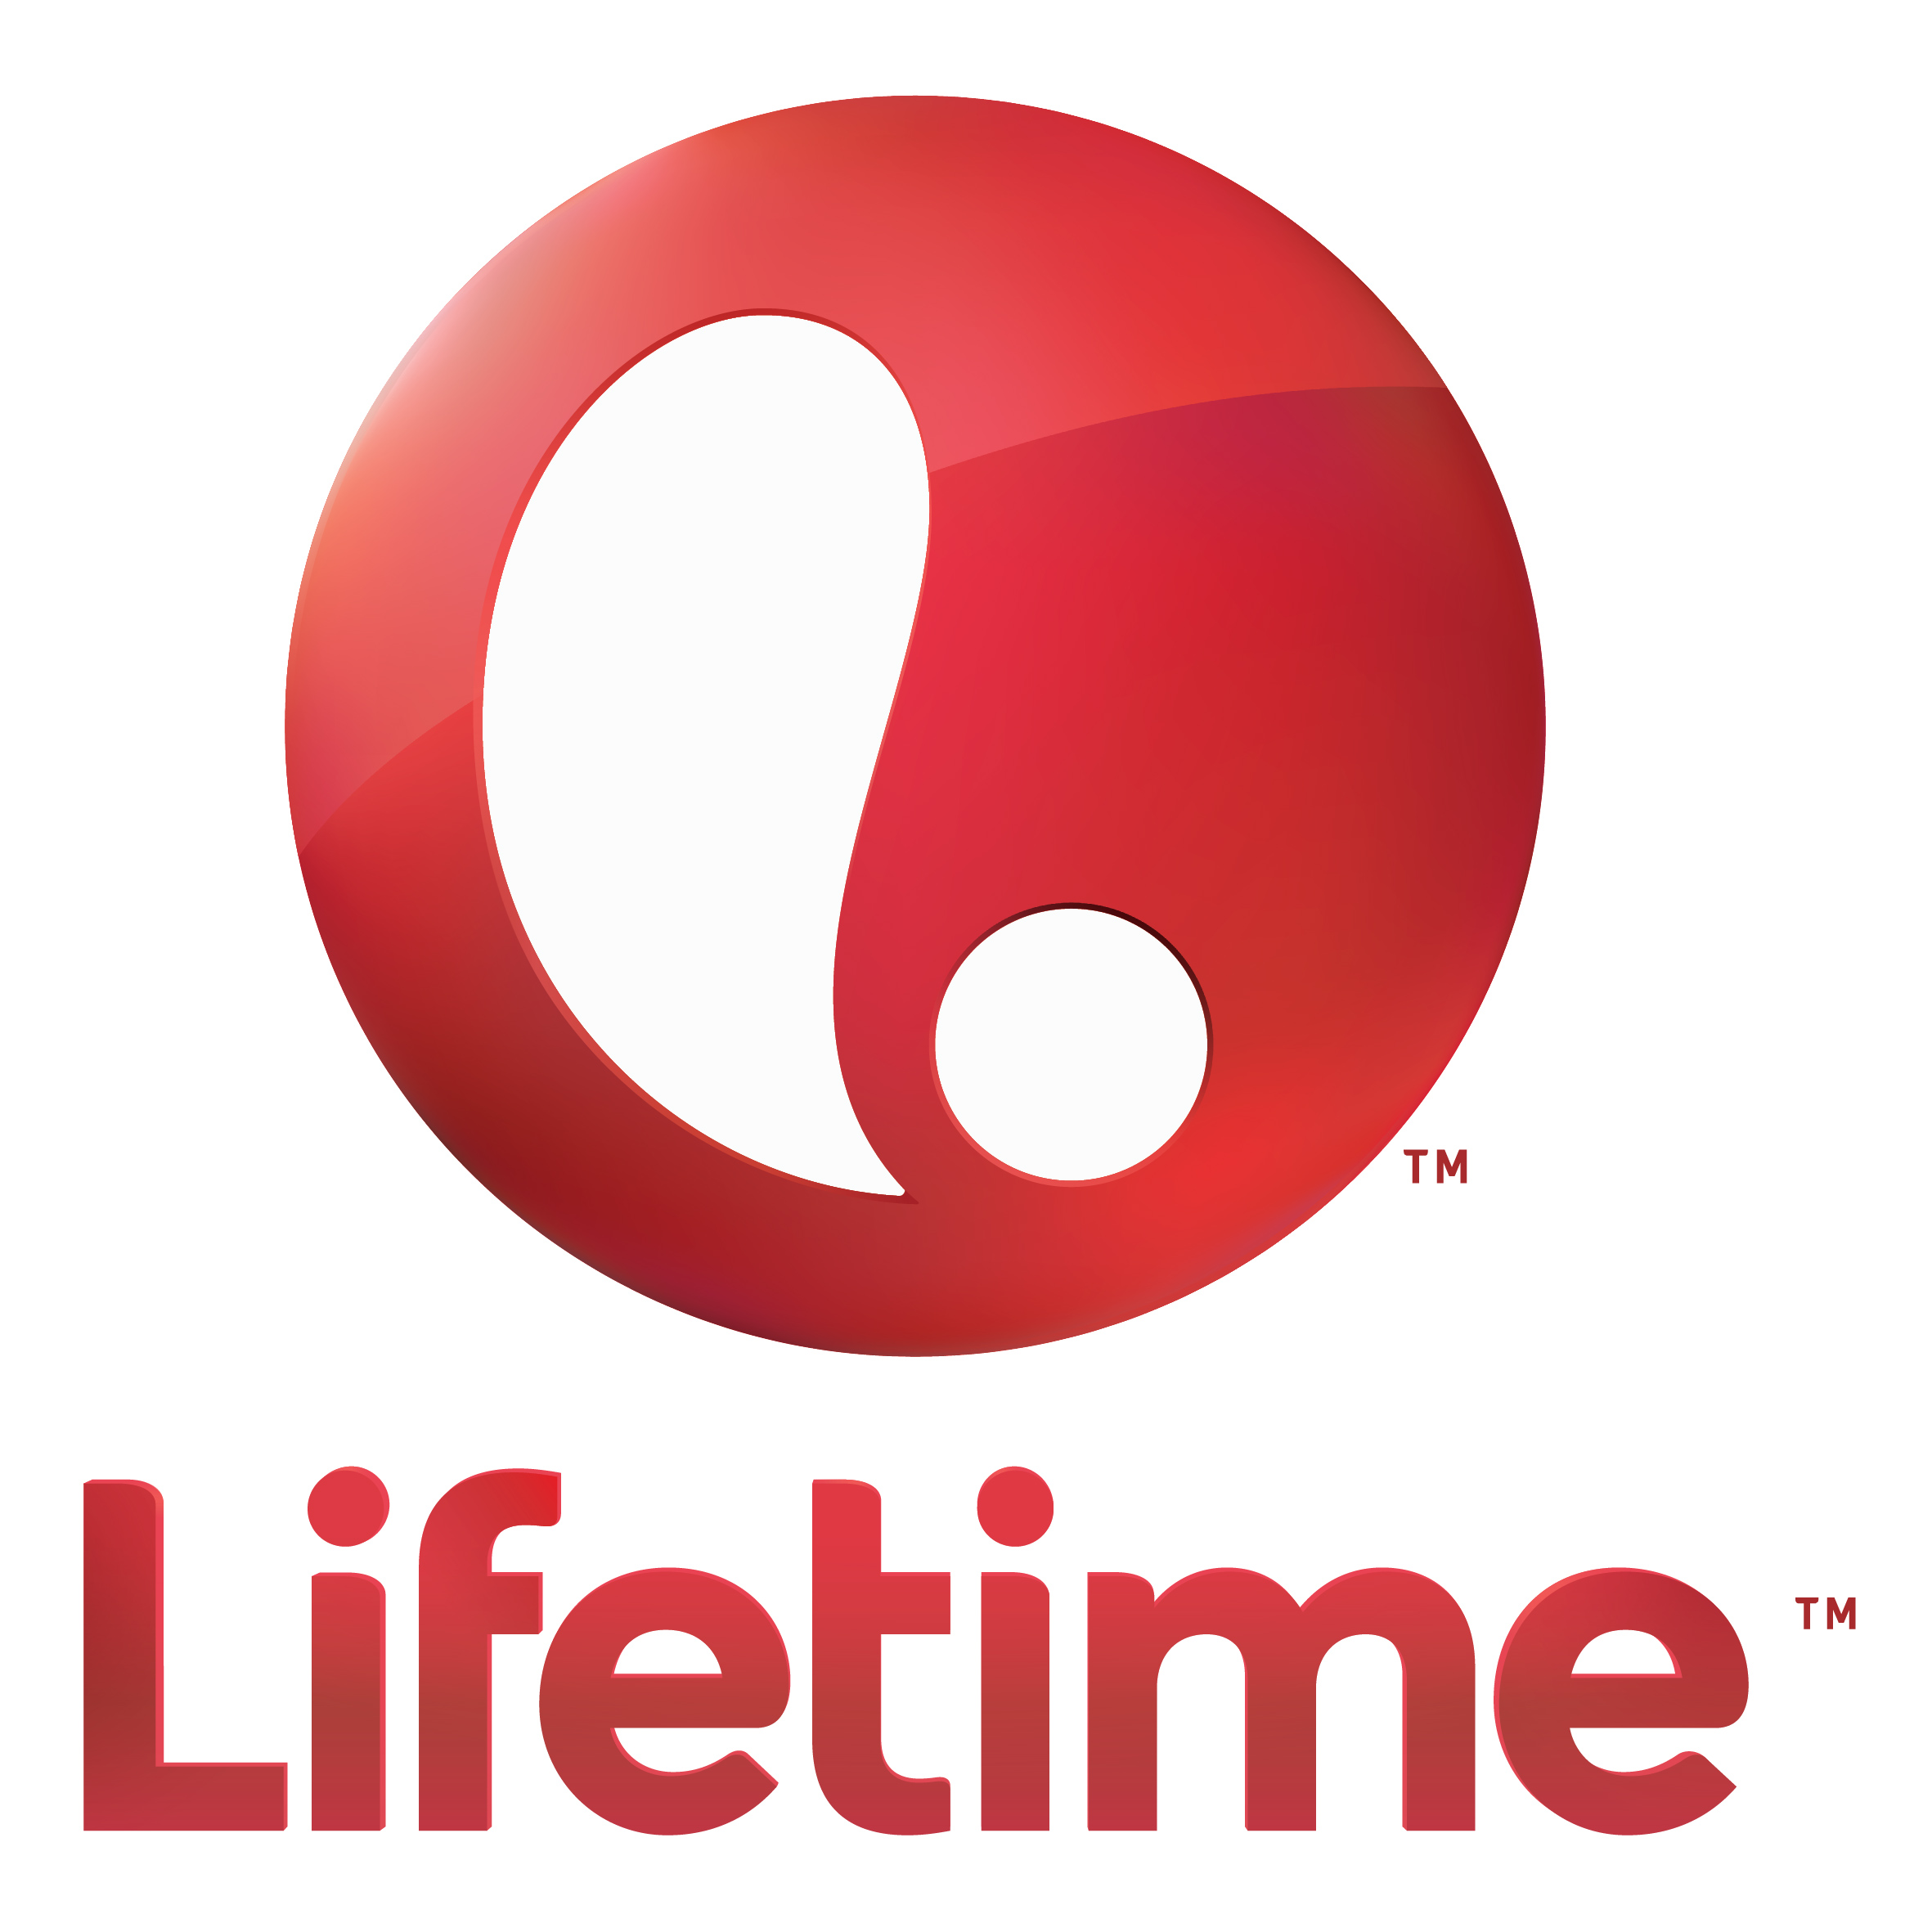 Lifetime™